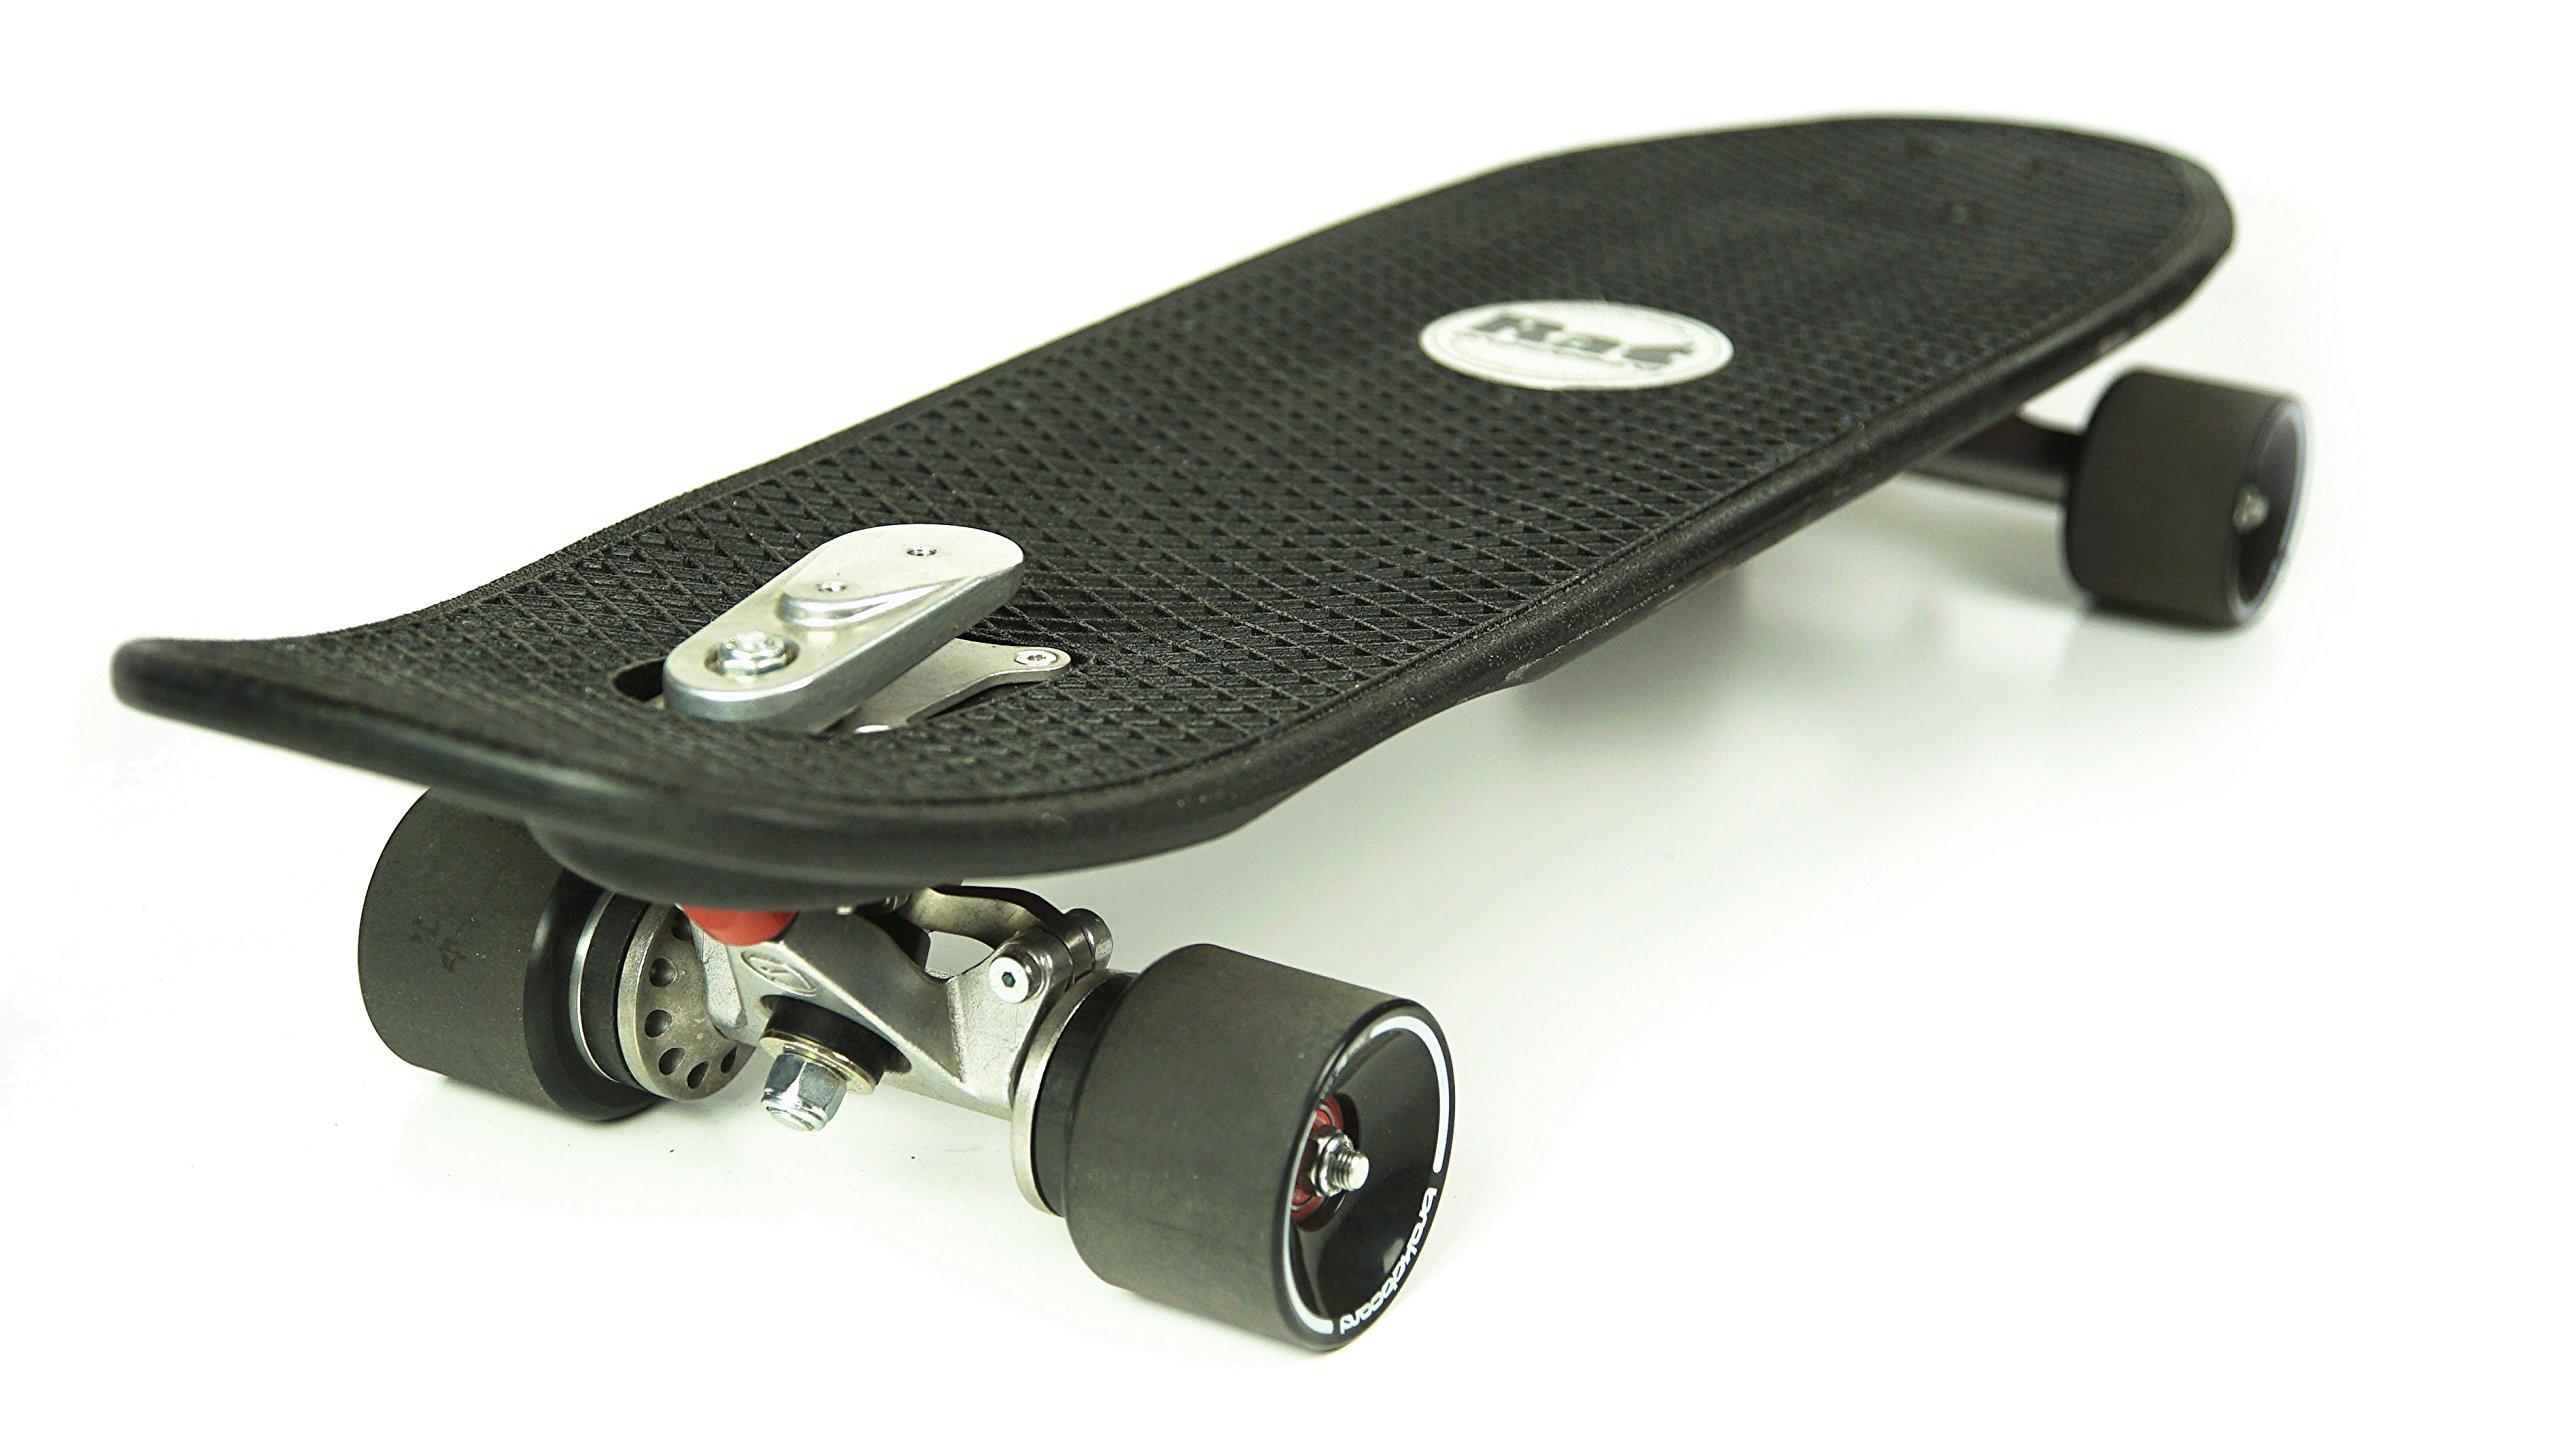 Brakeboard Rat. A skateboard with disc brakes by Brakeboard